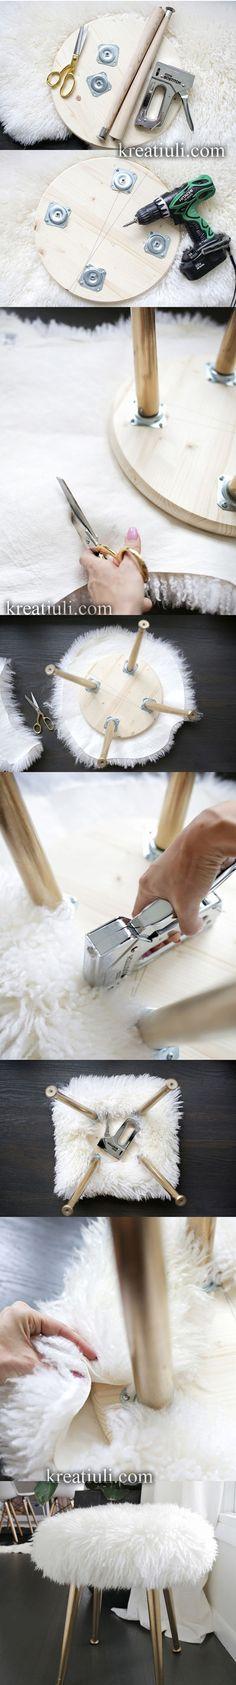 DIY, update, old, chair, for, living, room, გაალამაზეთ, პატარა, სკამი, მისაღები, ოთახისთვის, gaalamazet, patara, skami, misagebi, otaxistvis,